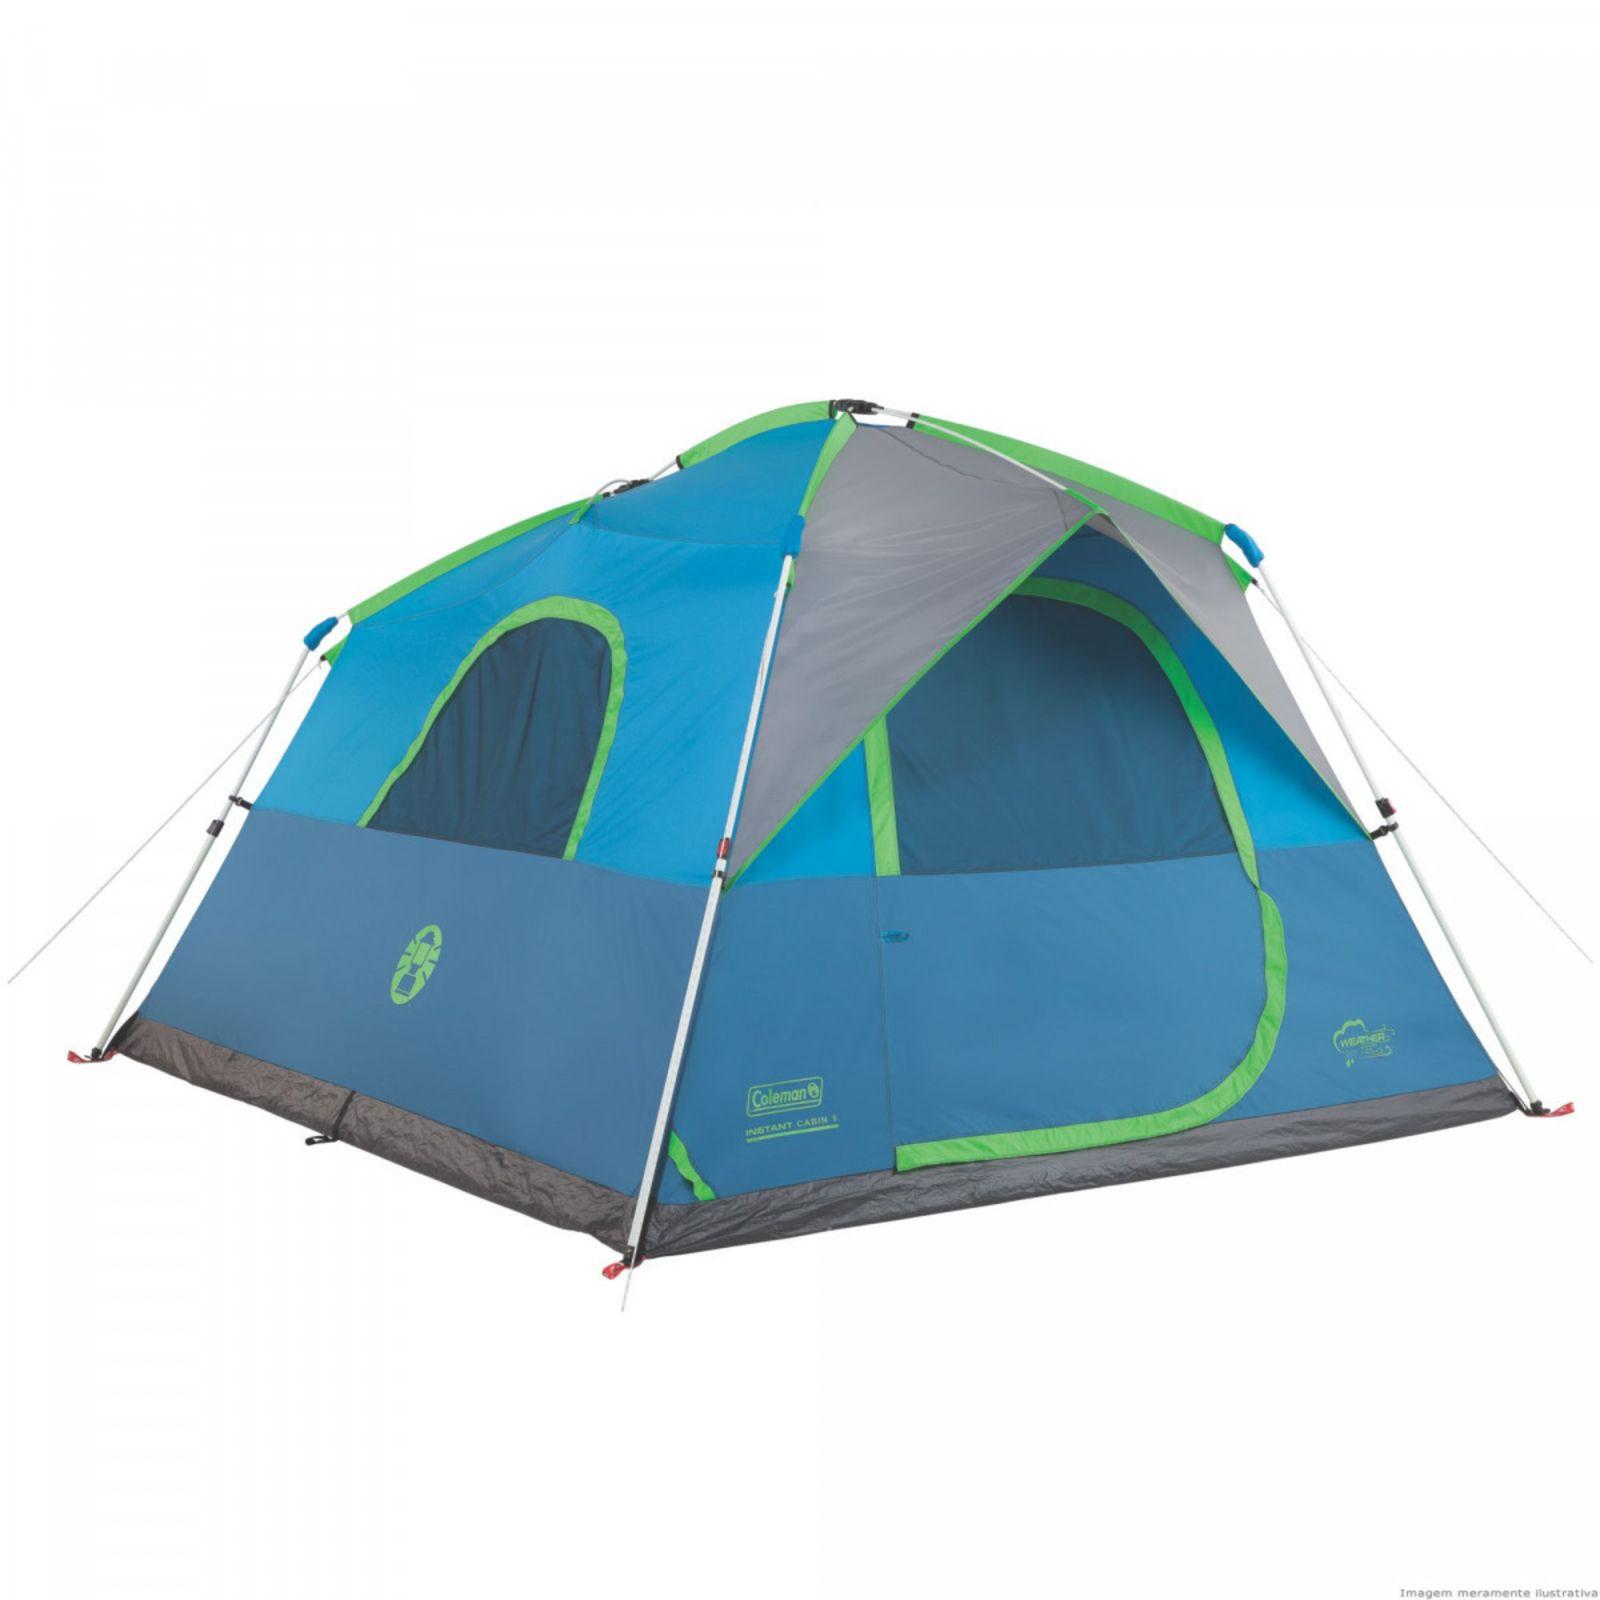 Barraca de Camping Coleman Signal Mountain 6 pessoas